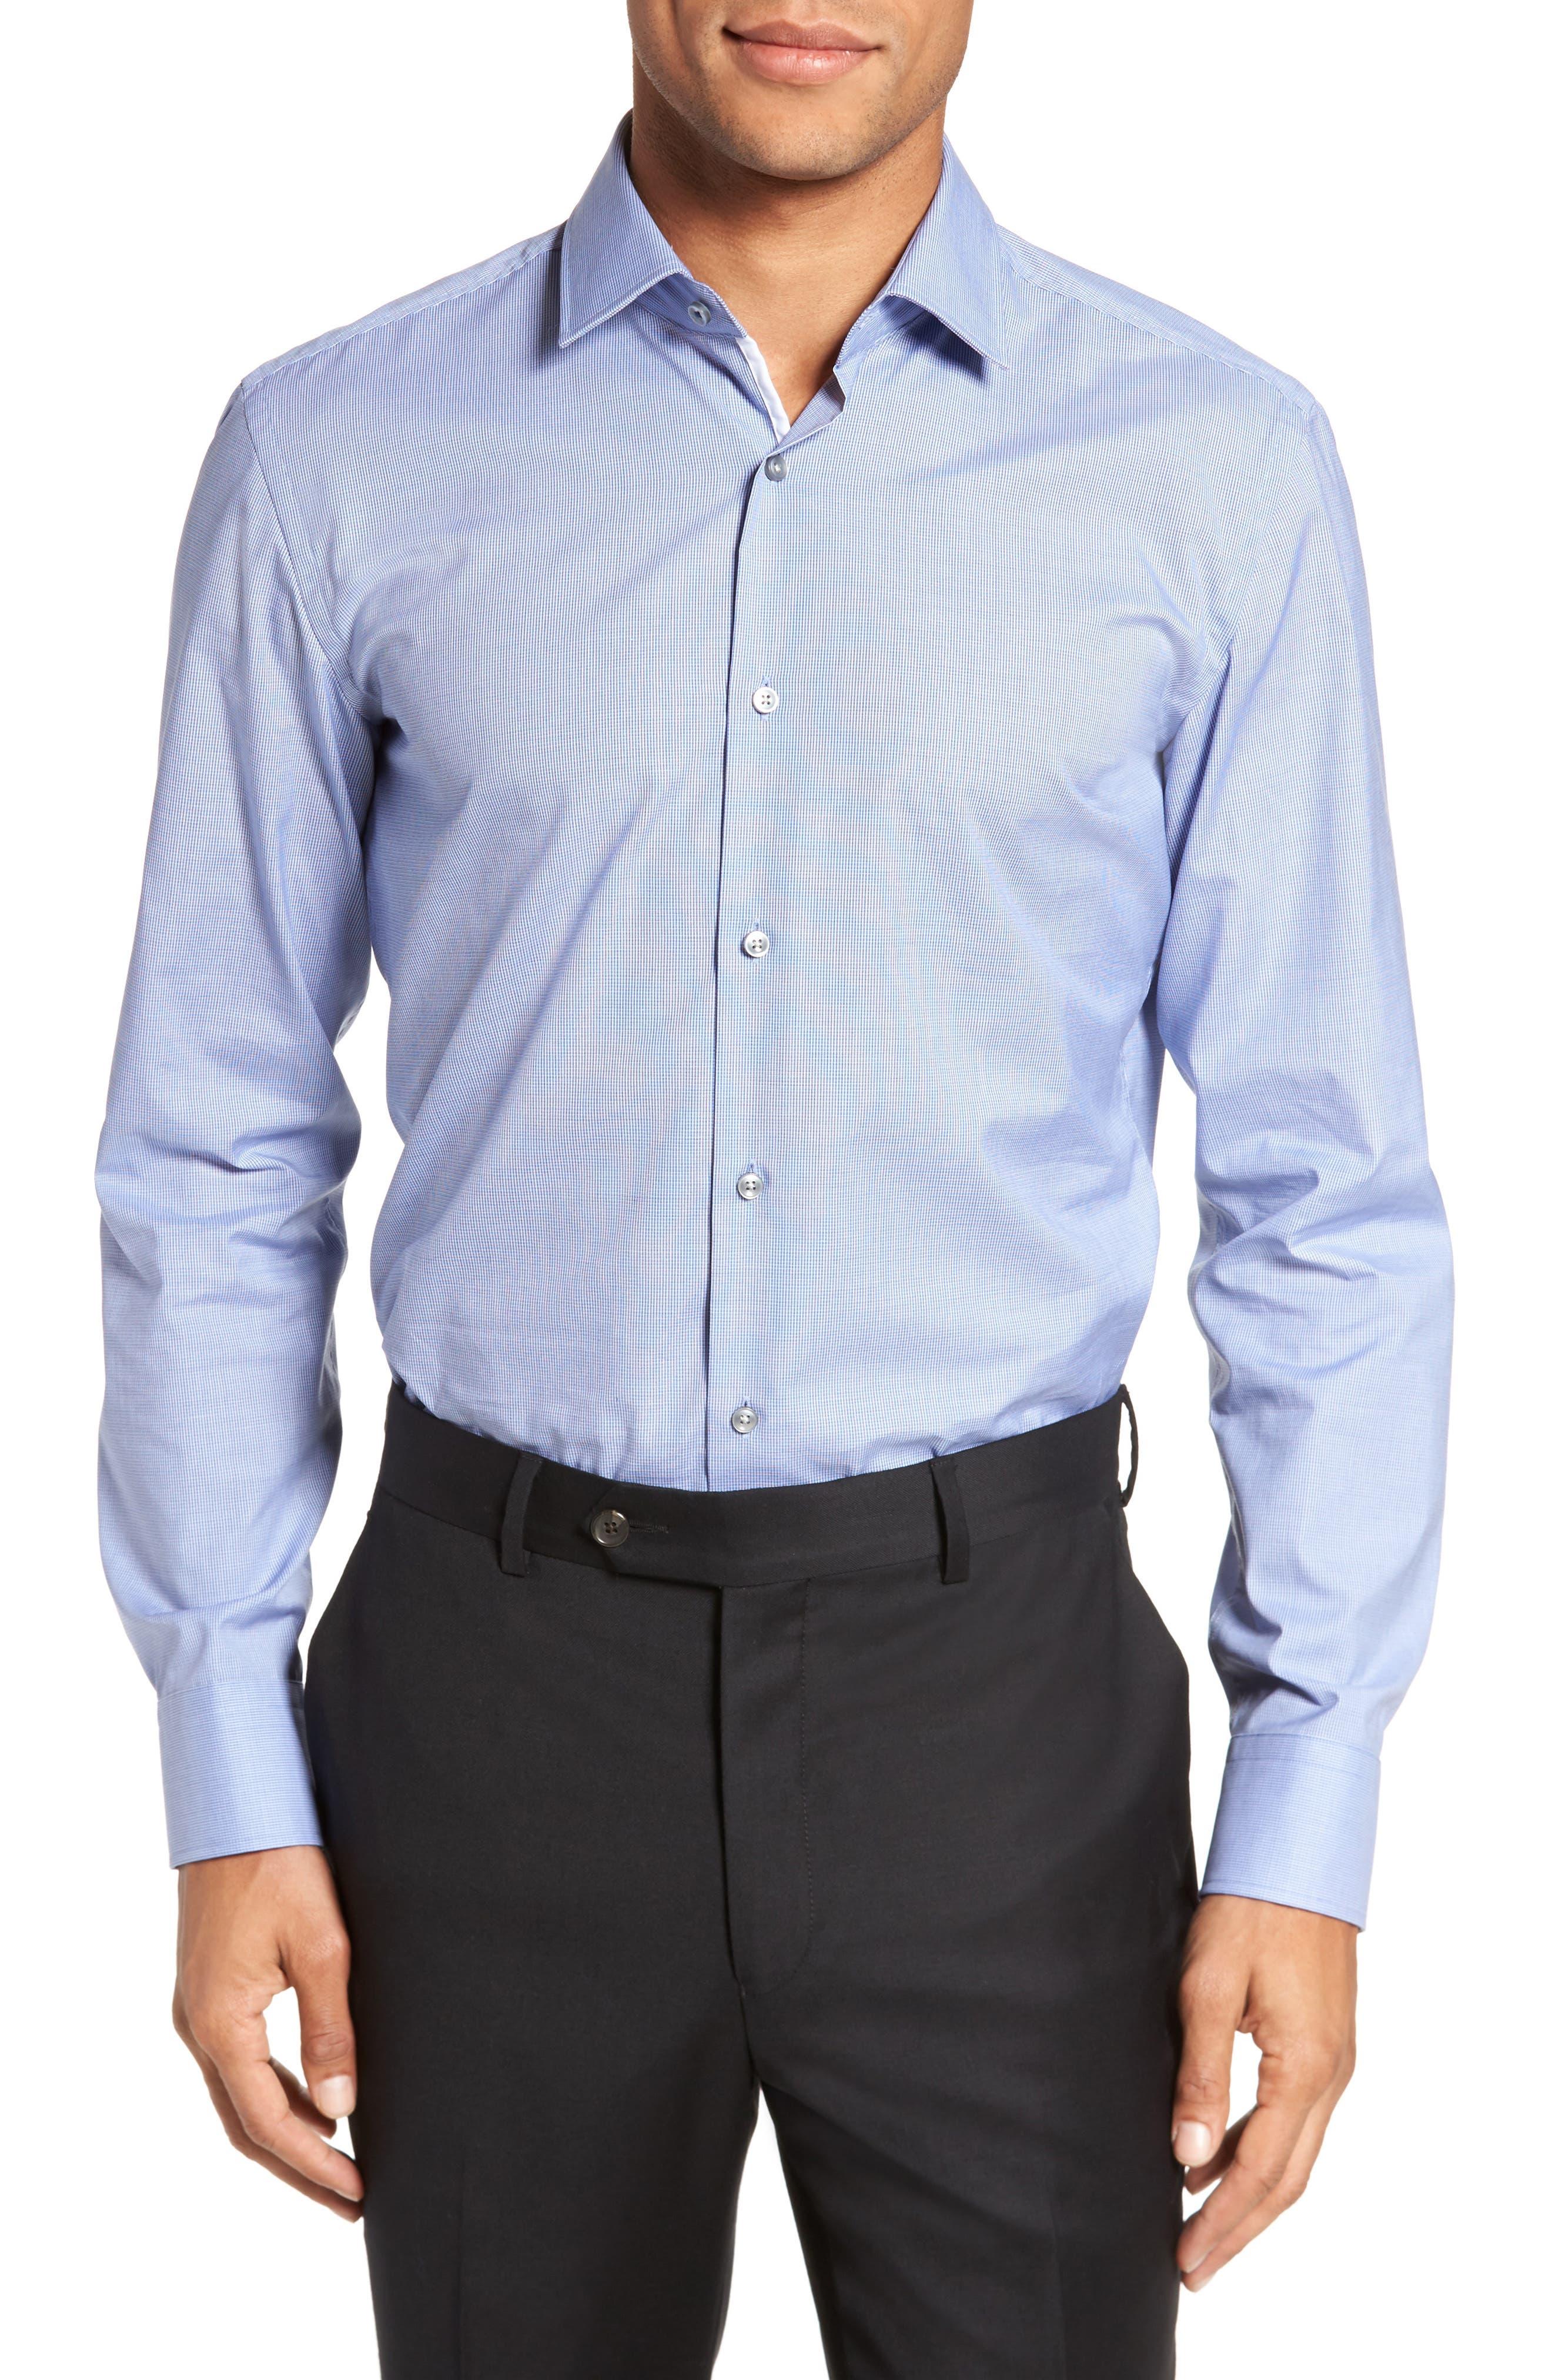 2e69758f0 Hugo Boss Classic Fit Dress Shirt - Cotswold Hire